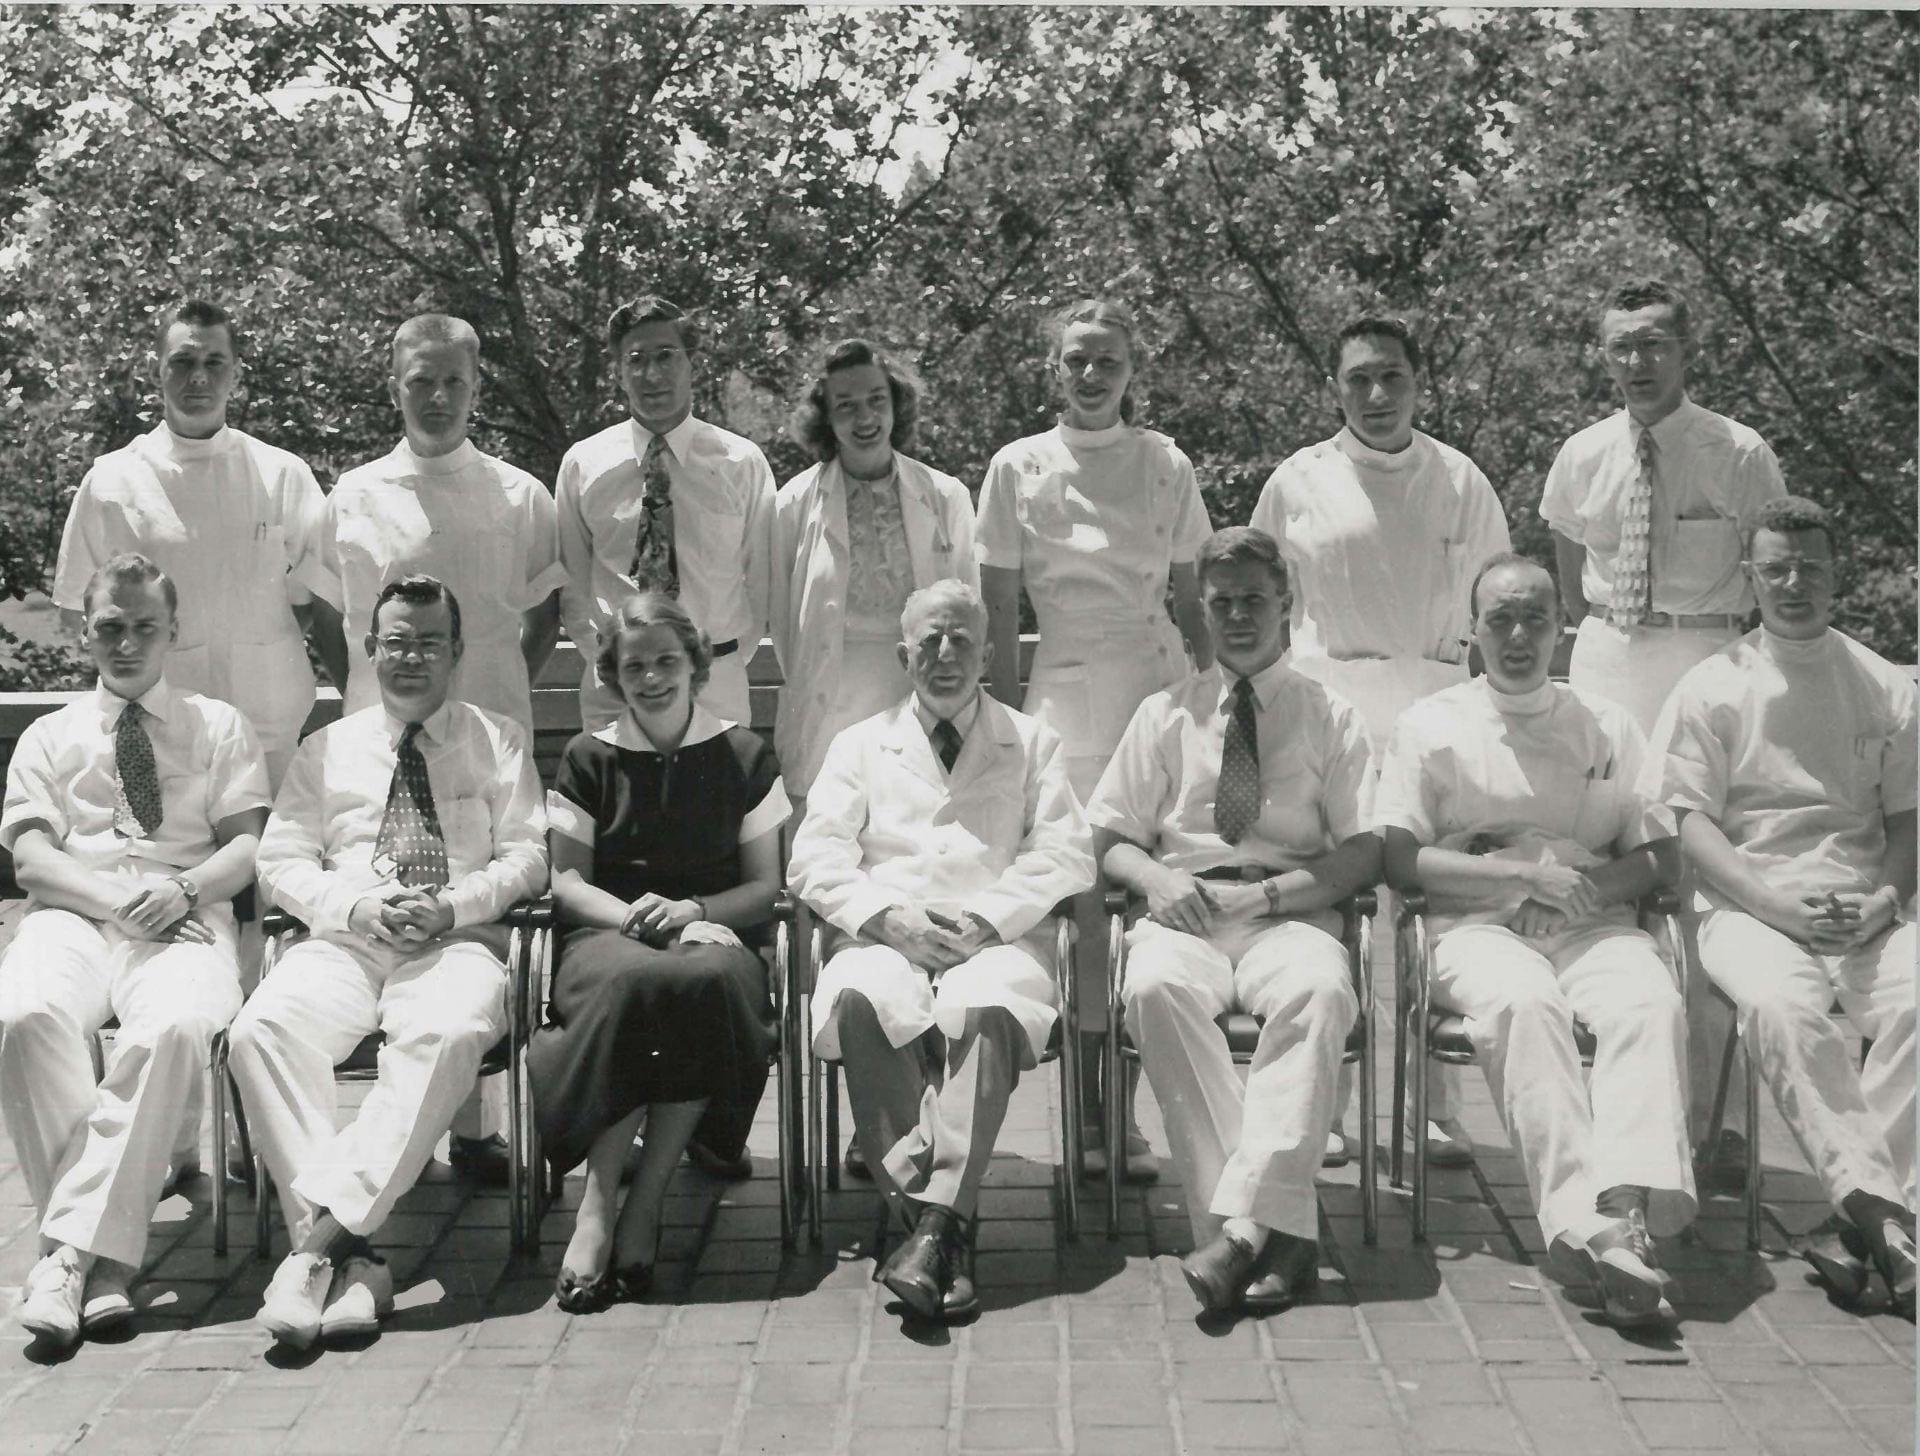 1950 Housestaff Photo (2)